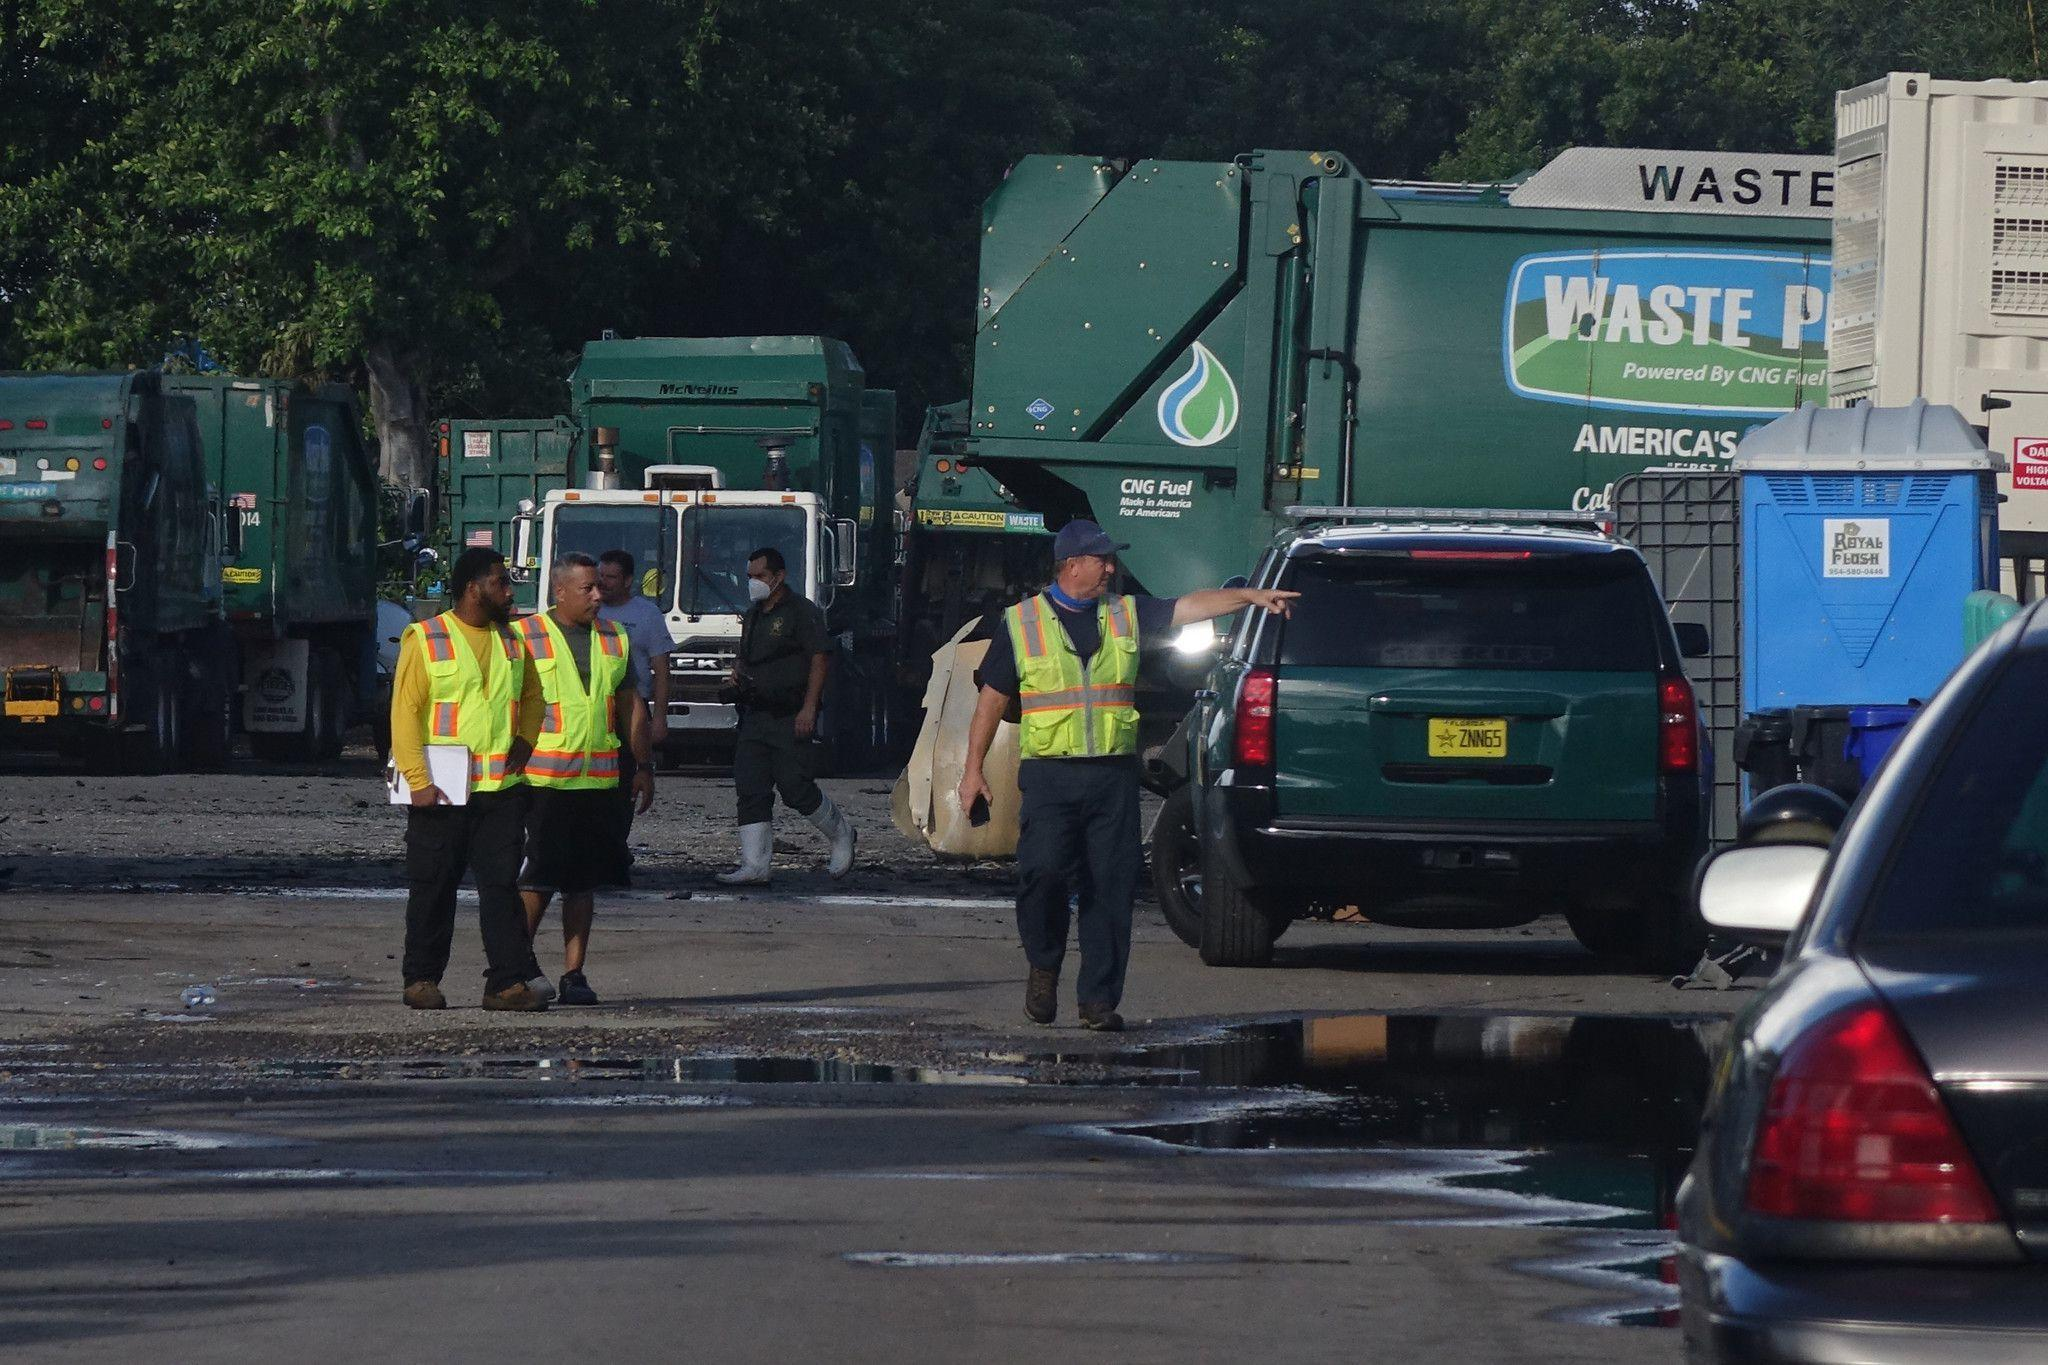 10 garbage trucks burned overnight in Pompano Beach